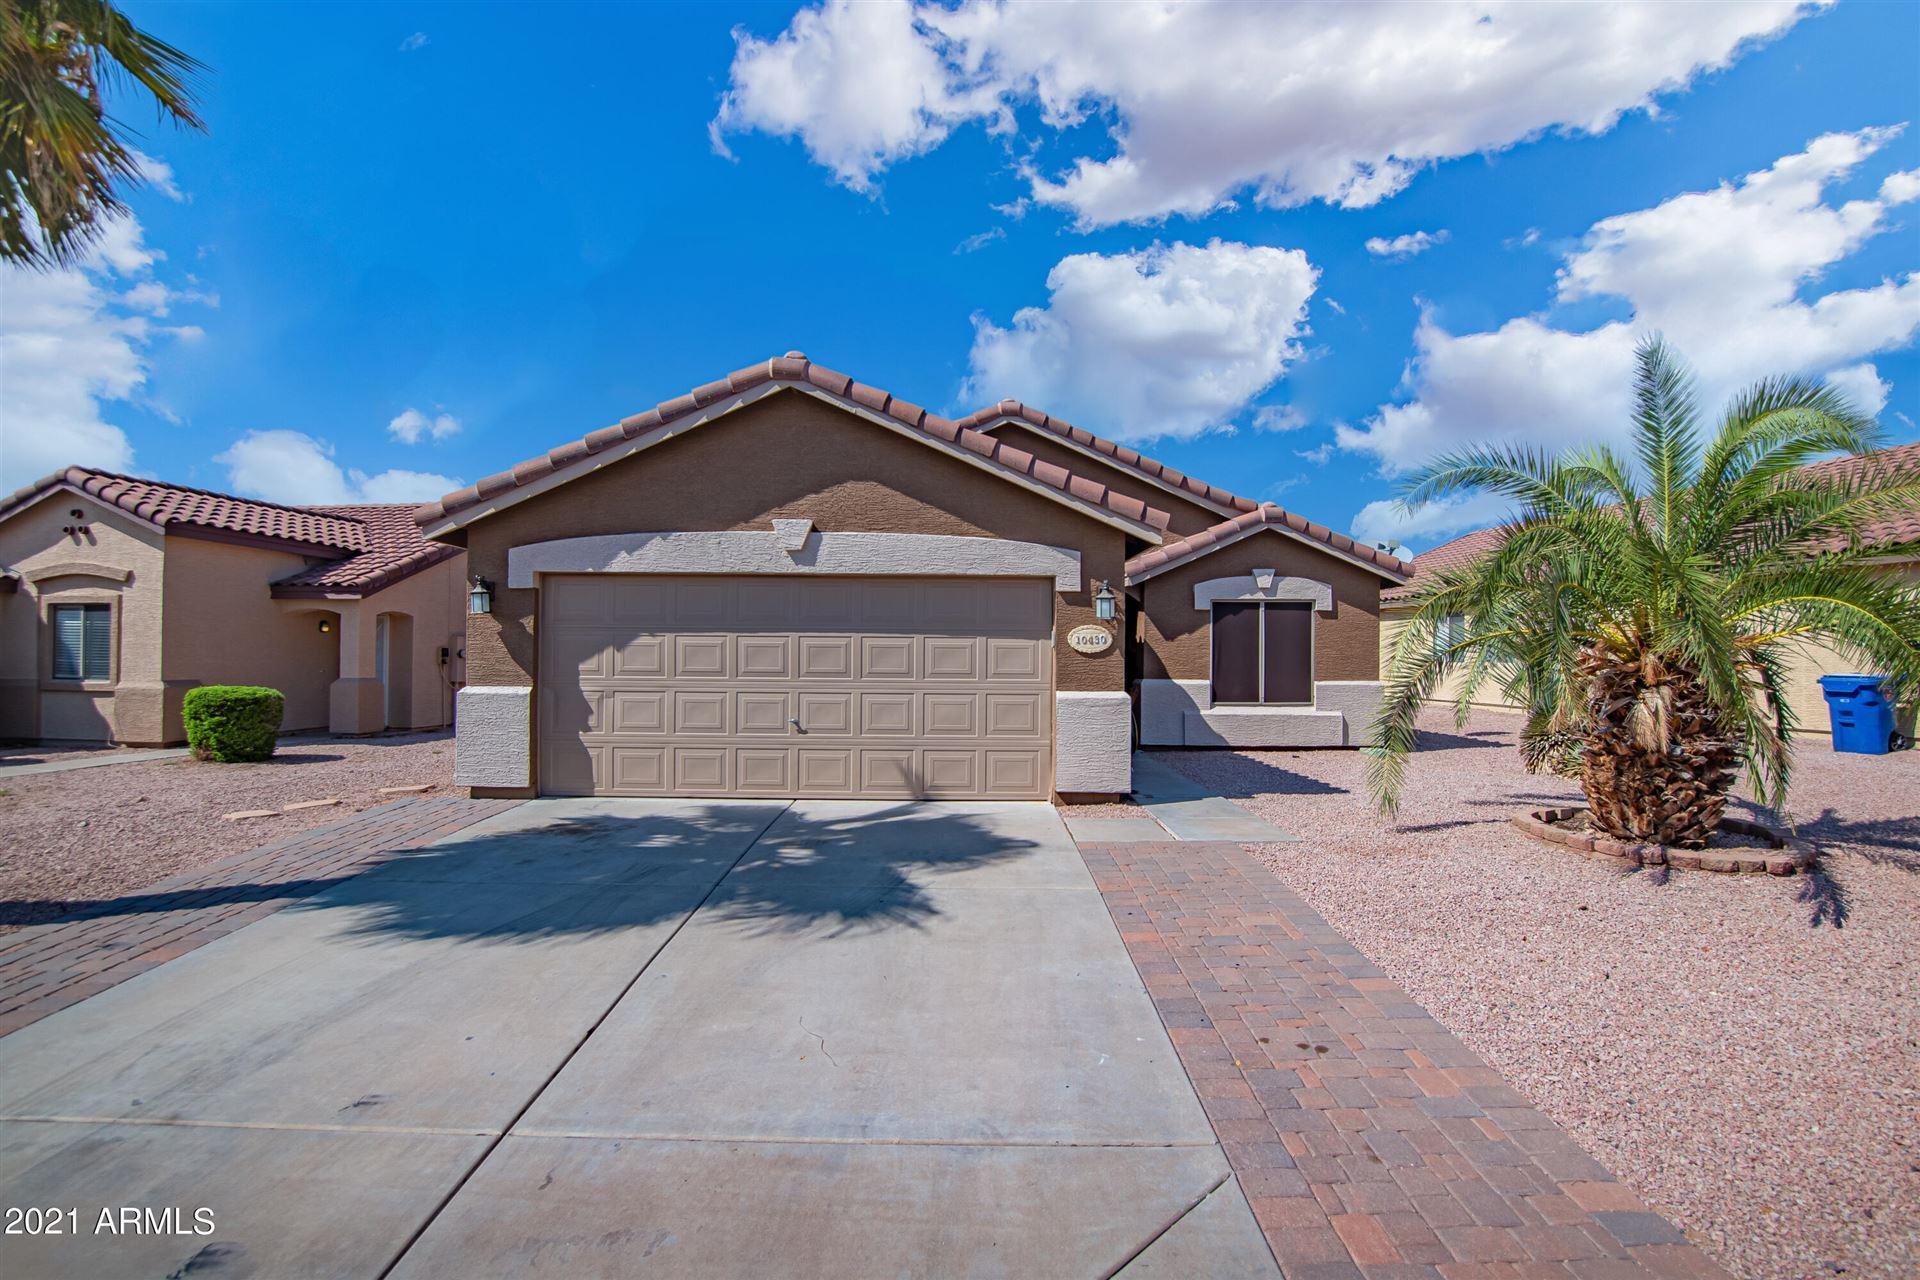 10430 E BRAMBLE Avenue, Mesa, AZ 85208 - MLS#: 6293926